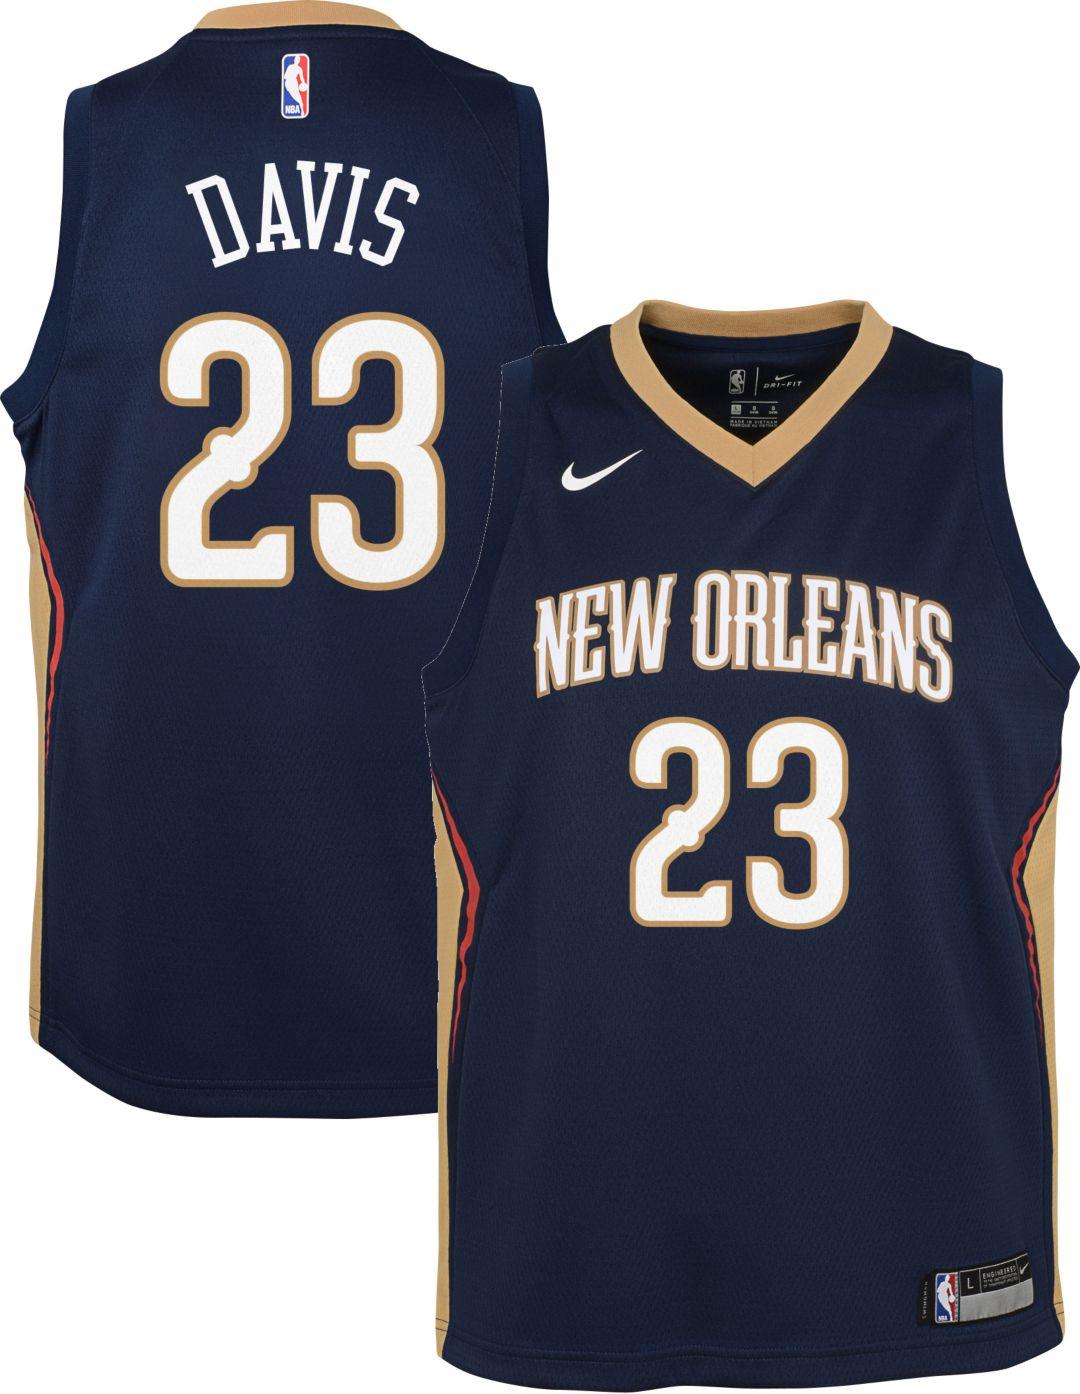 012294c8182 Nike Youth New Orleans Pelicans Anthony Davis #23 Navy Dri-FIT Swingman  Jersey 1